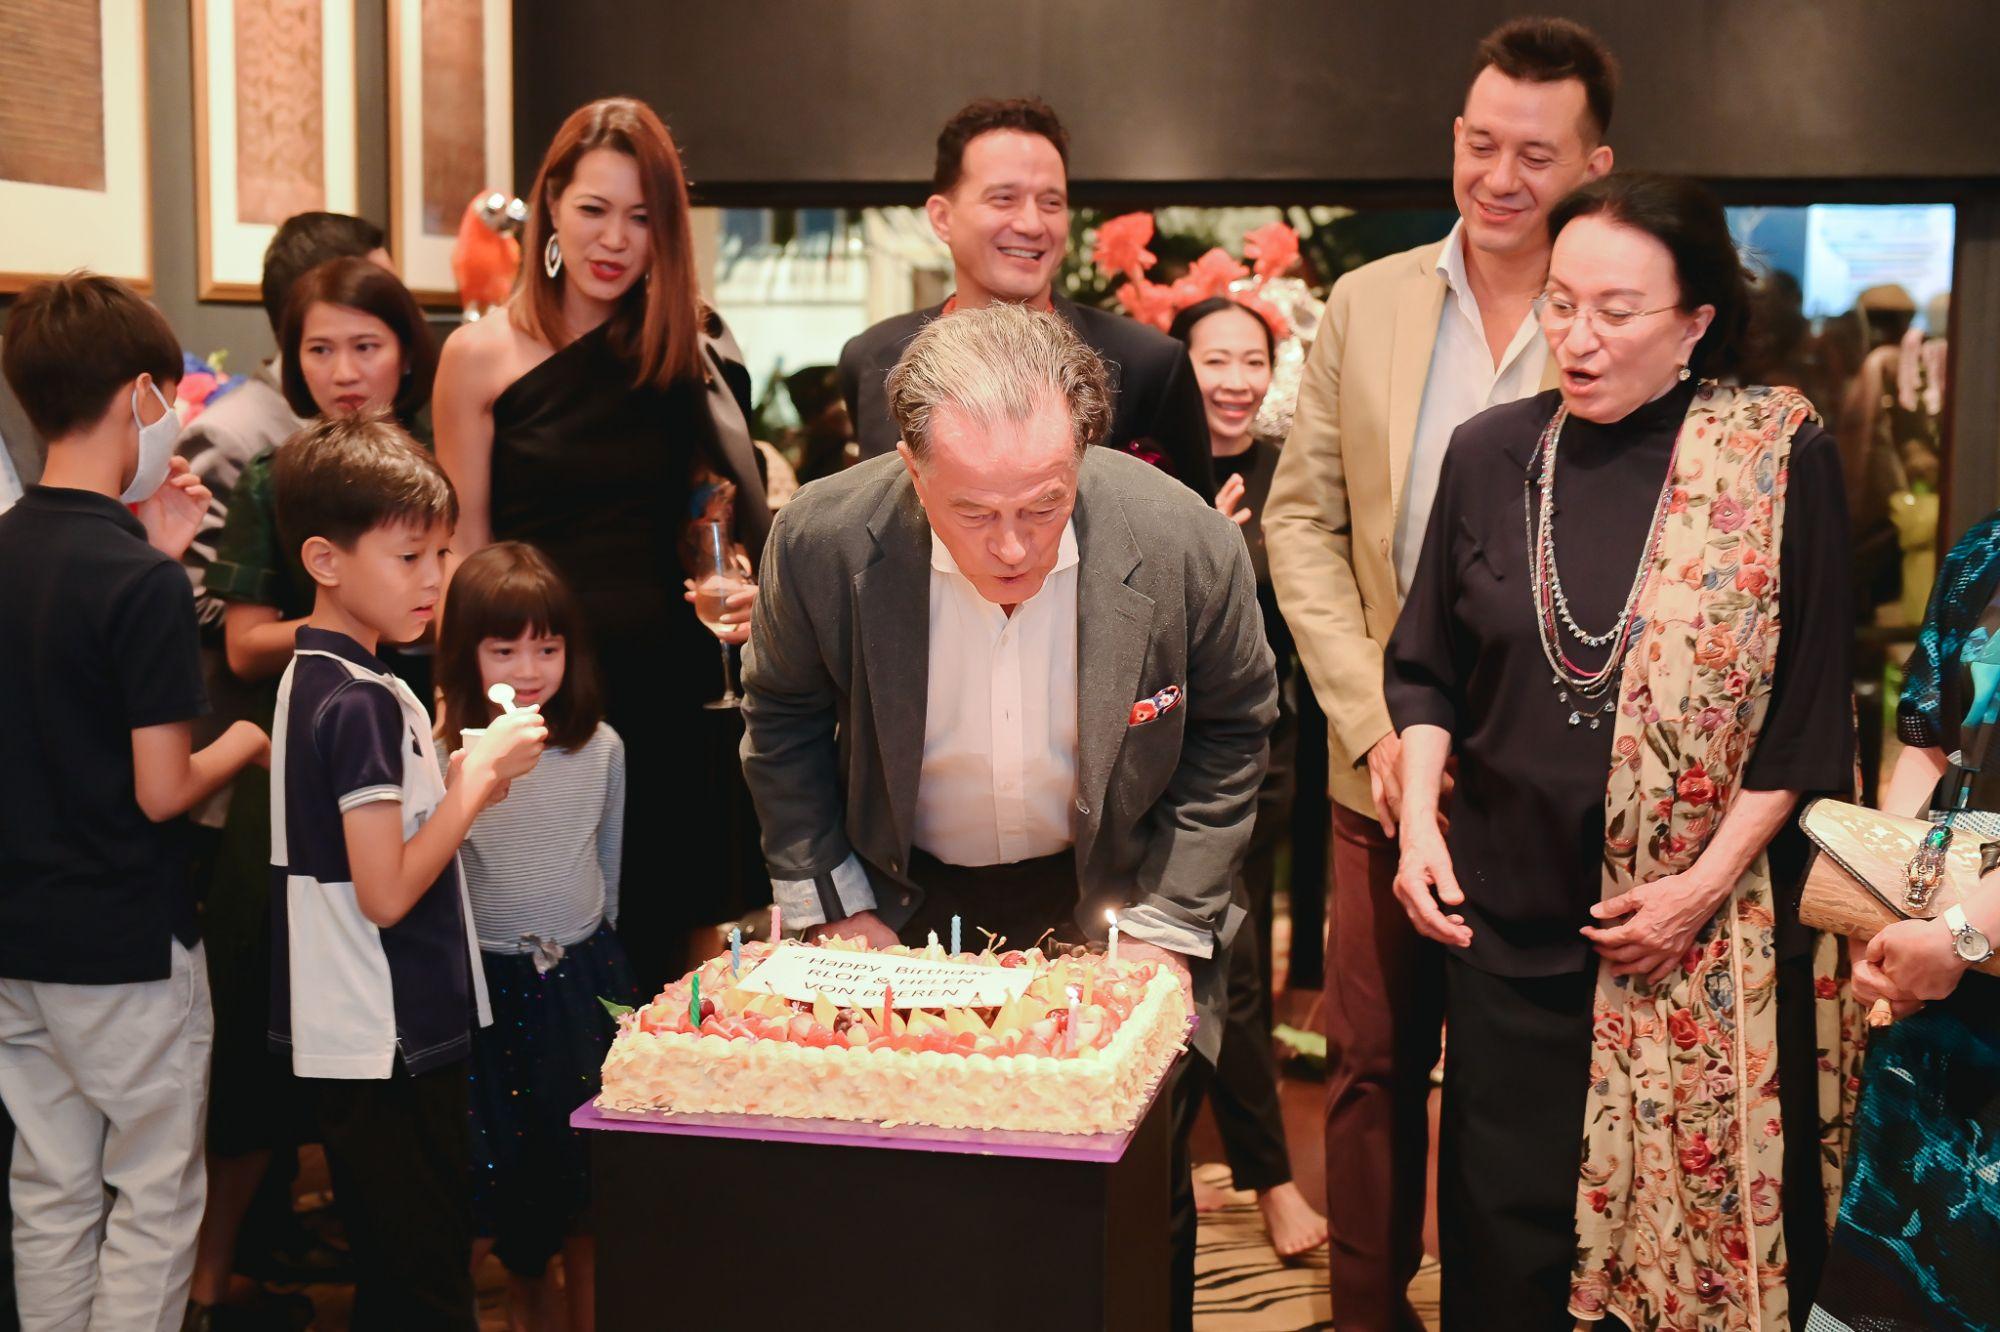 Lotus Arts De Vivre Celebrated Rolf Von Bueren's 80th Birthday With A Charitable Celebration